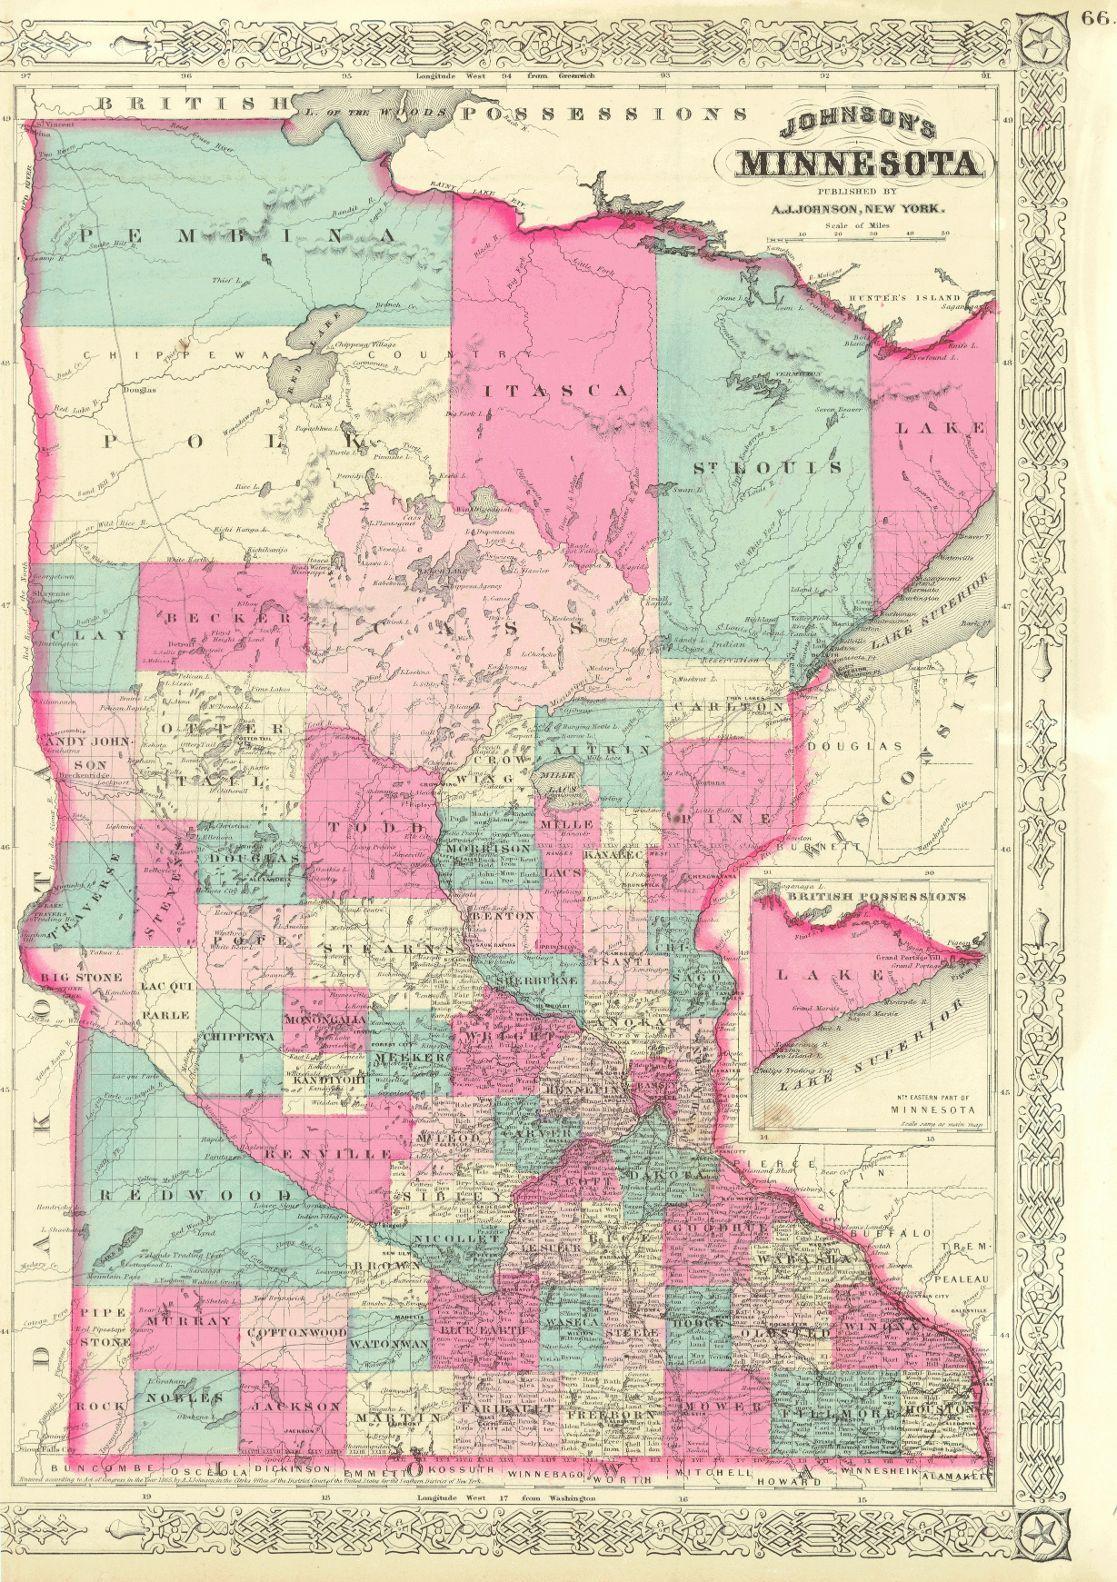 Johnson s Minnesota Map showing towns roads railroads